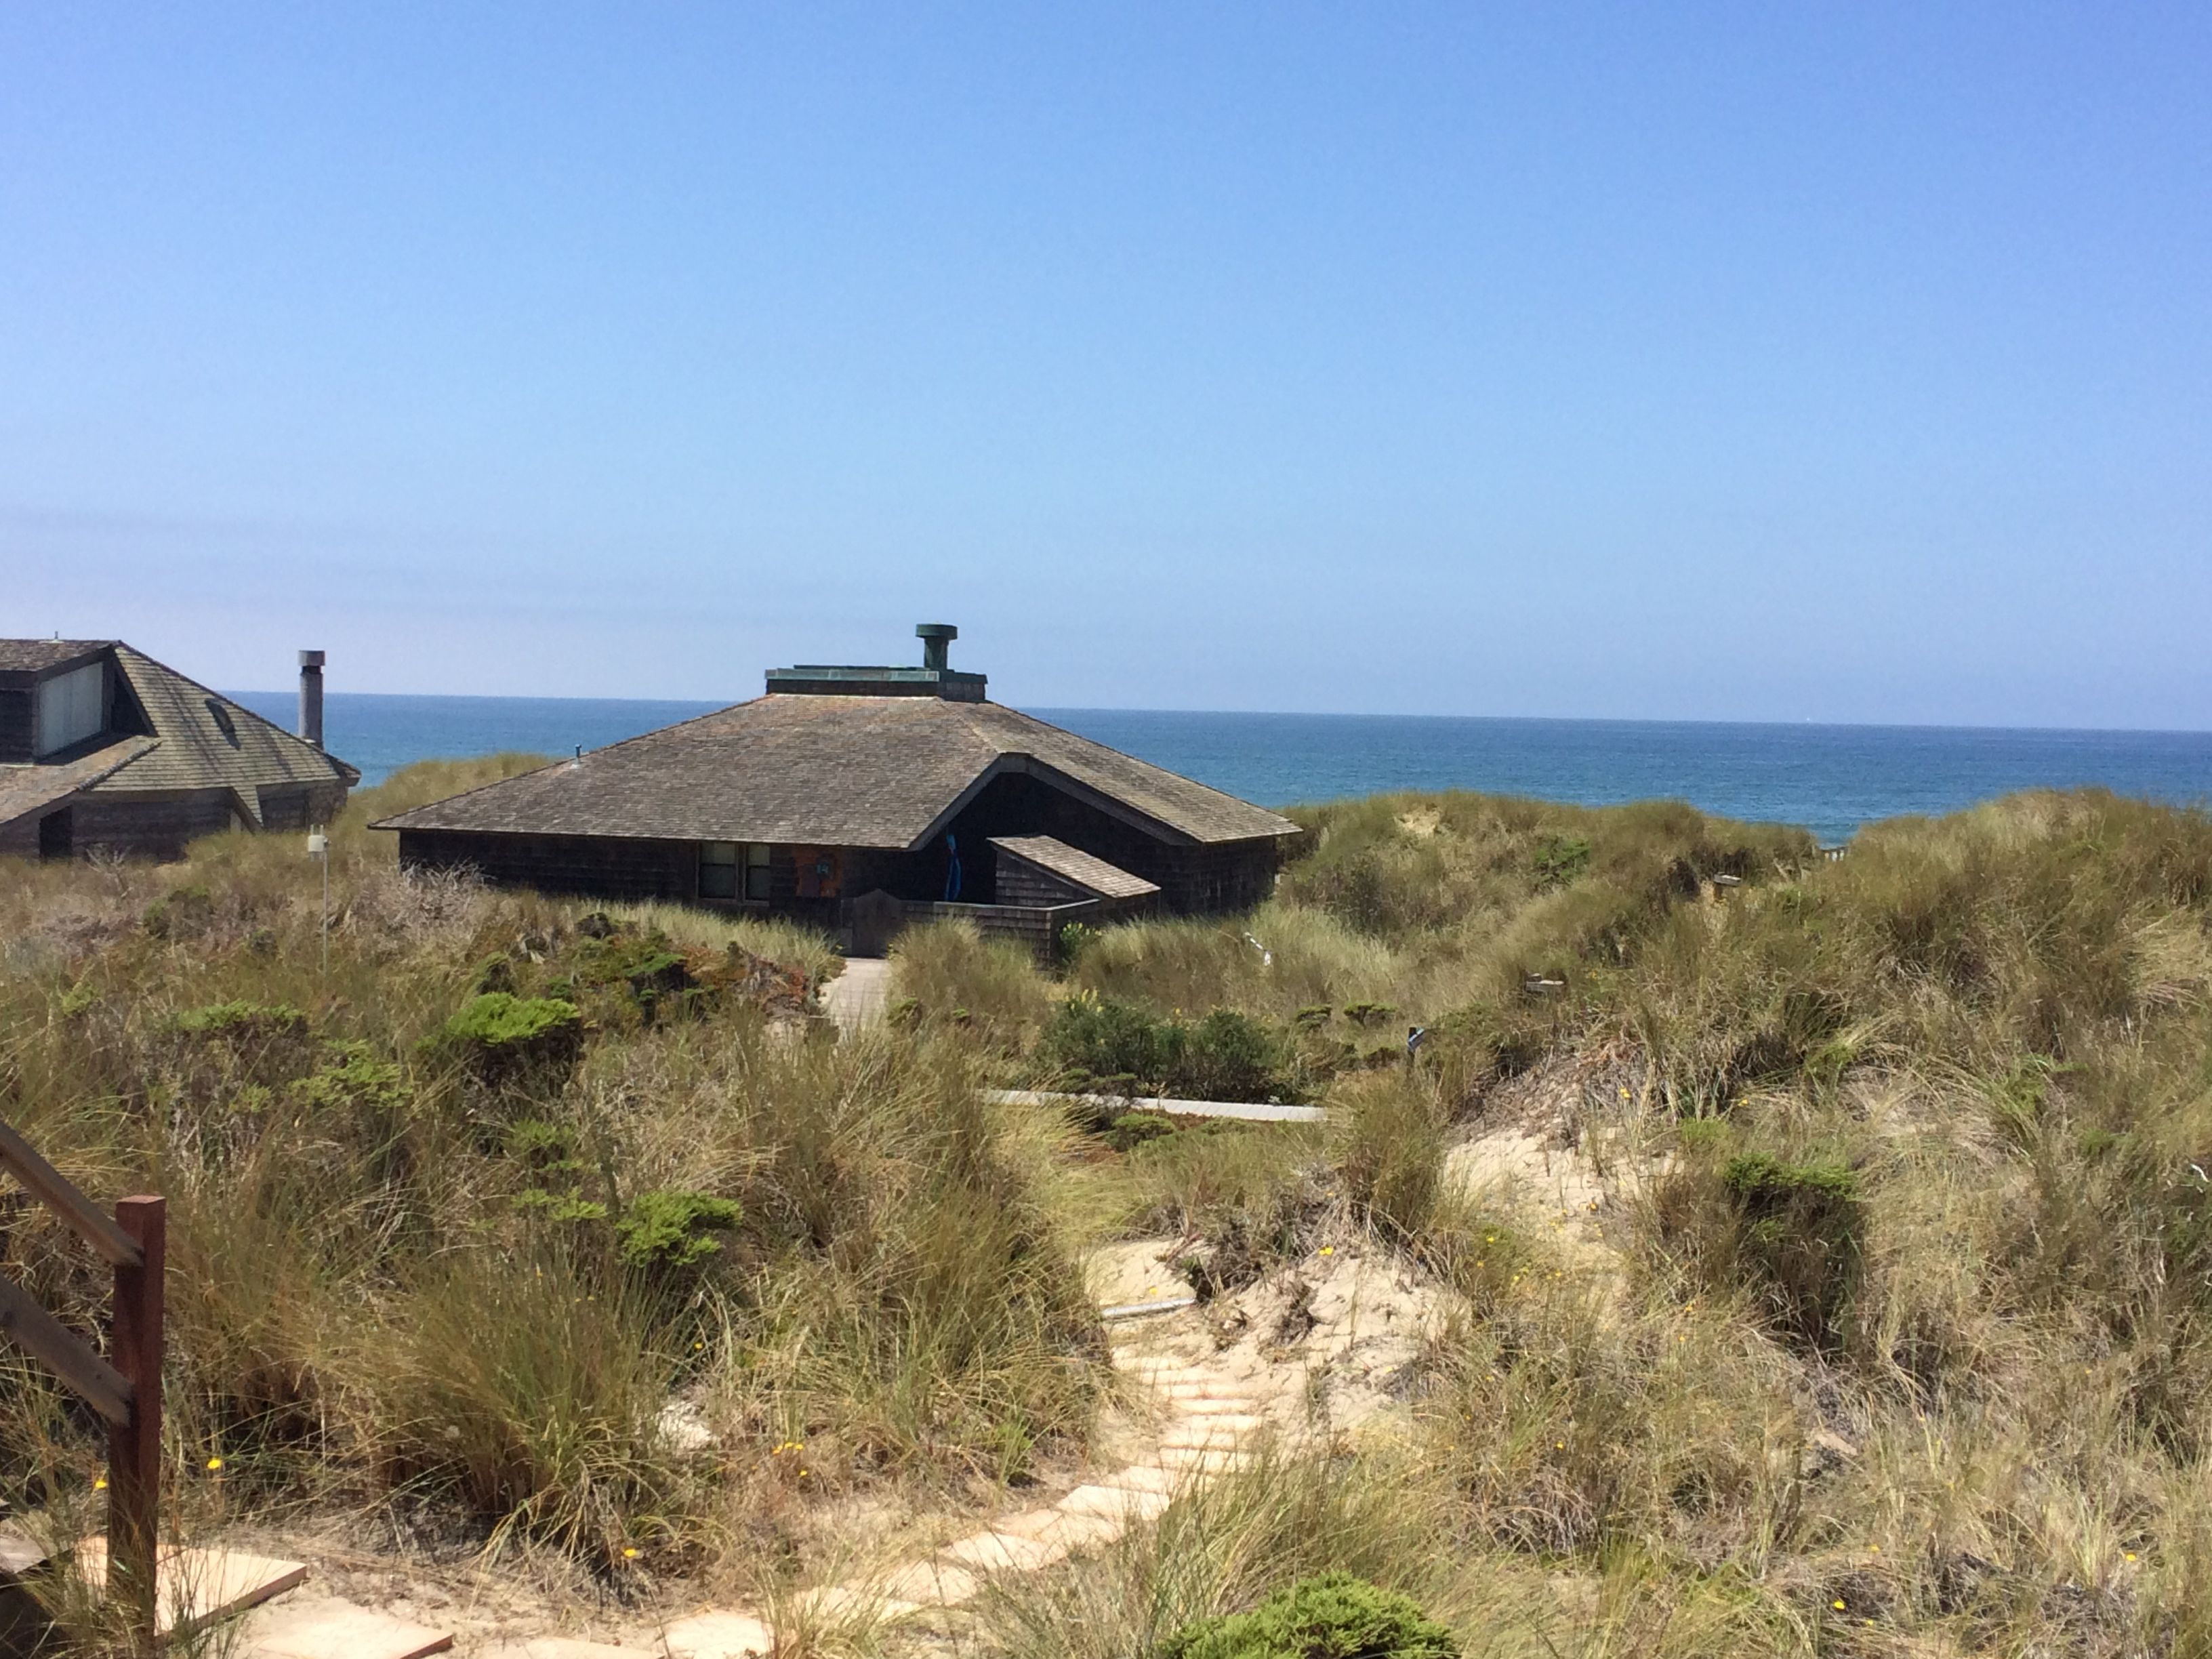 beach house view from pajaro dunes